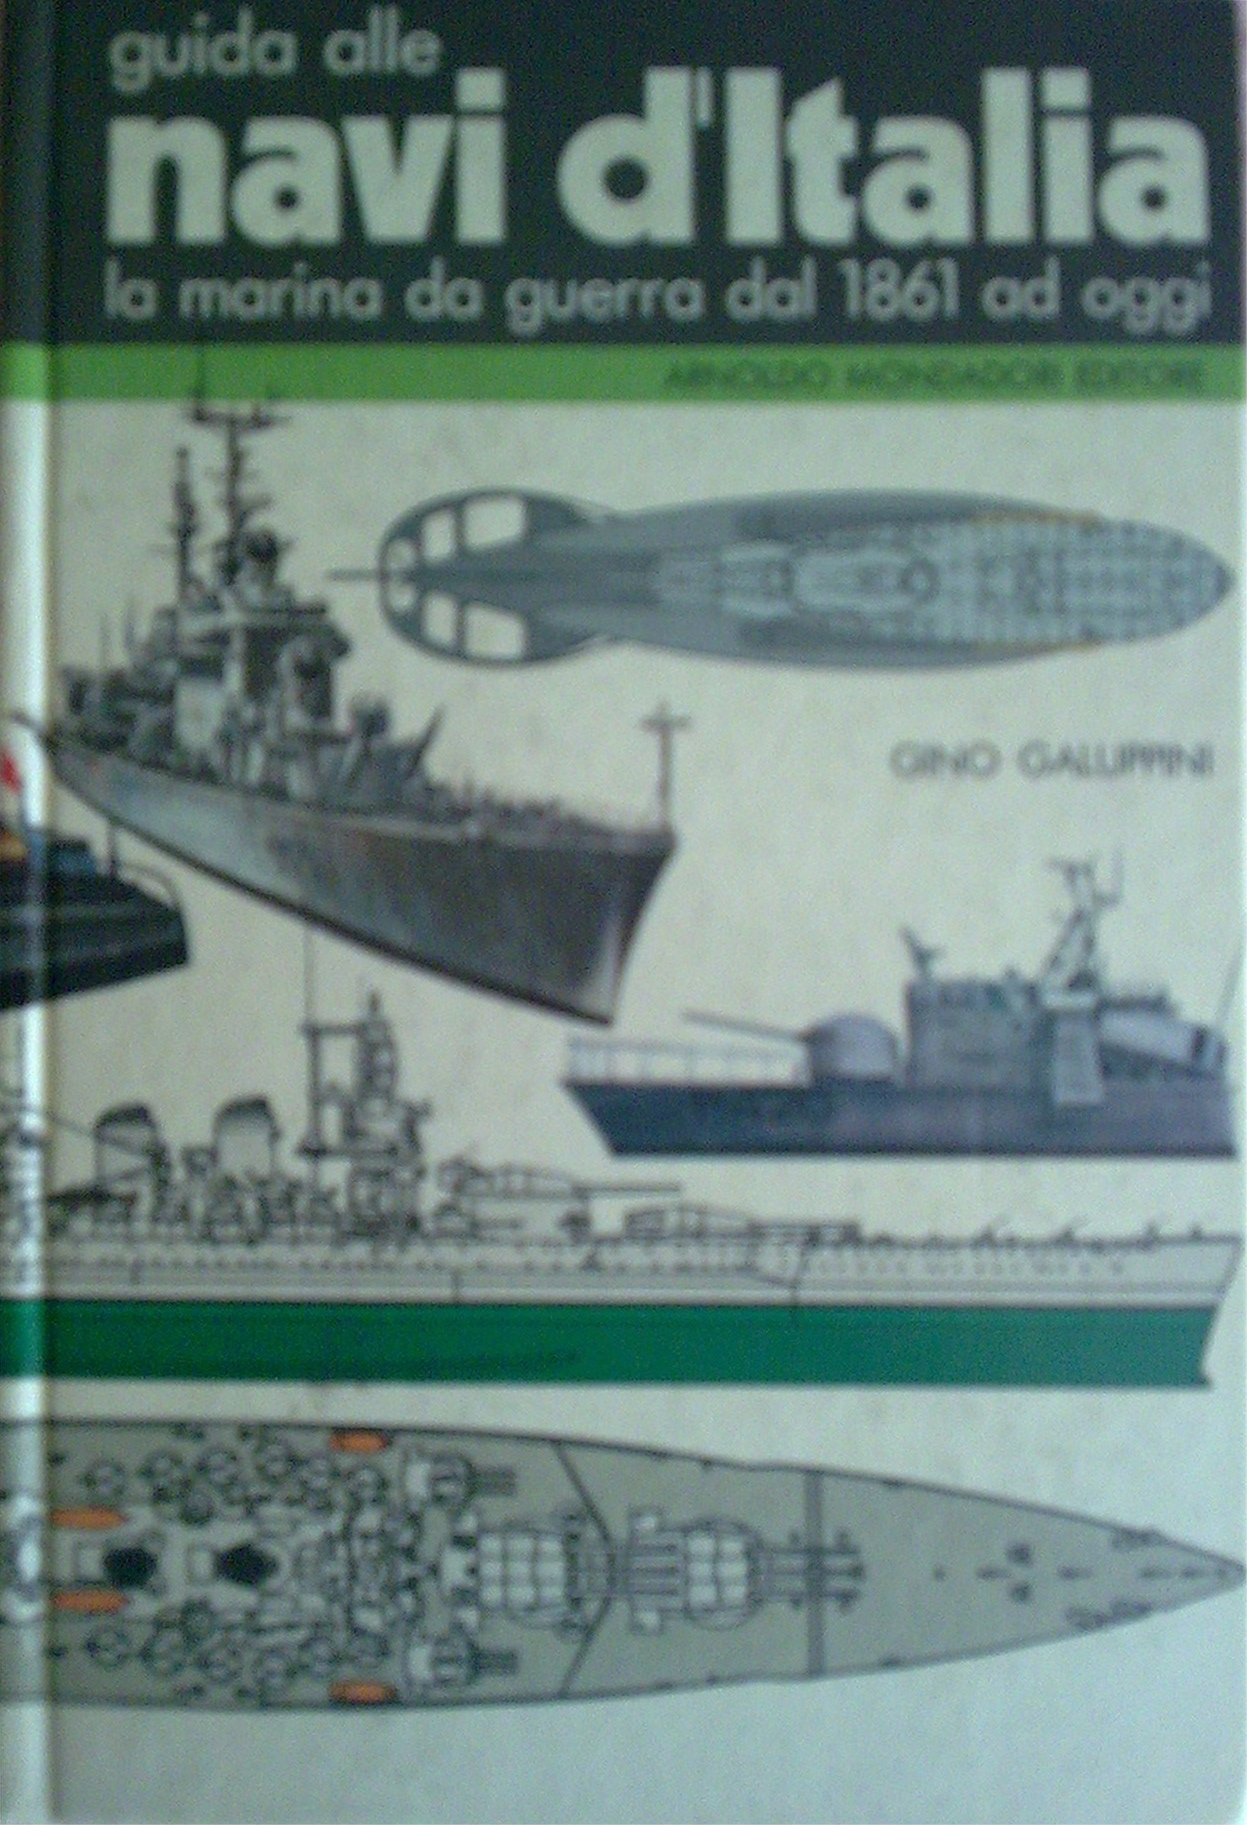 Guida alle navi d'Italia